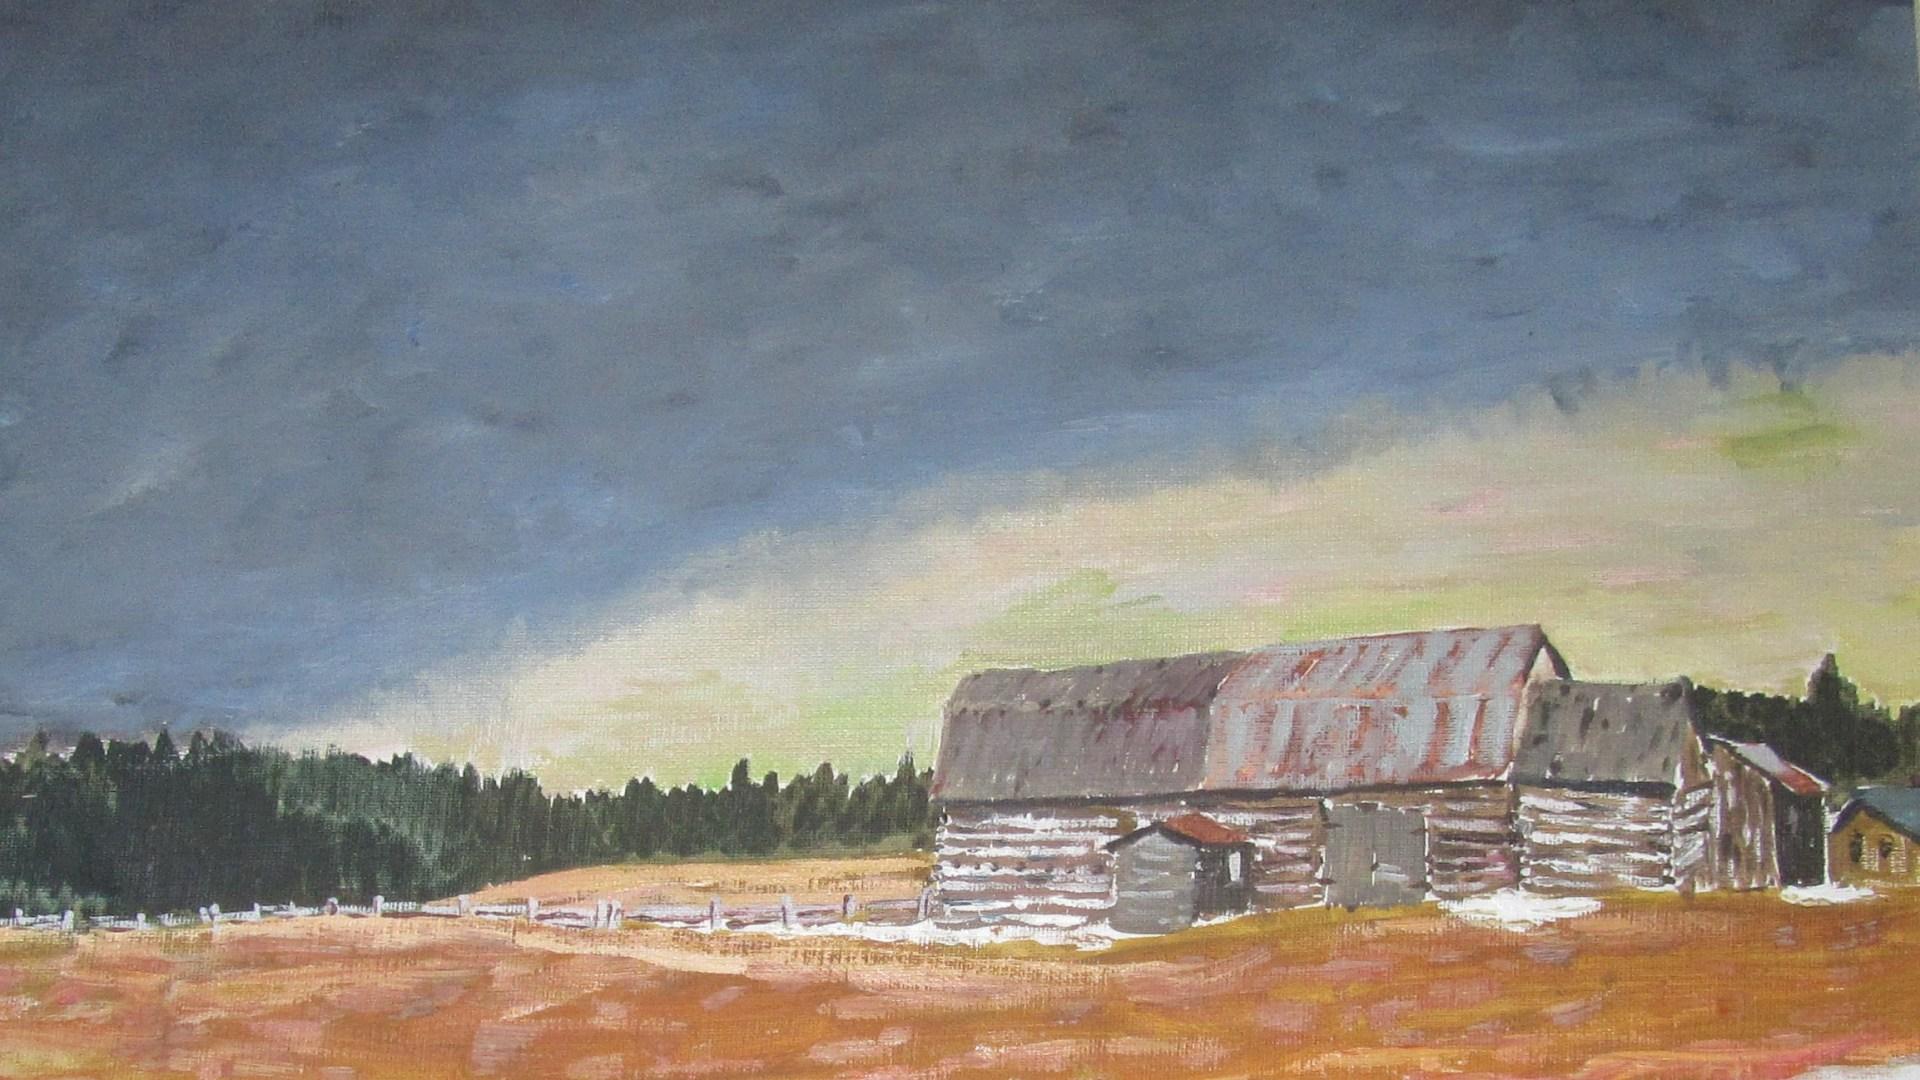 Ontario Barn Preservation